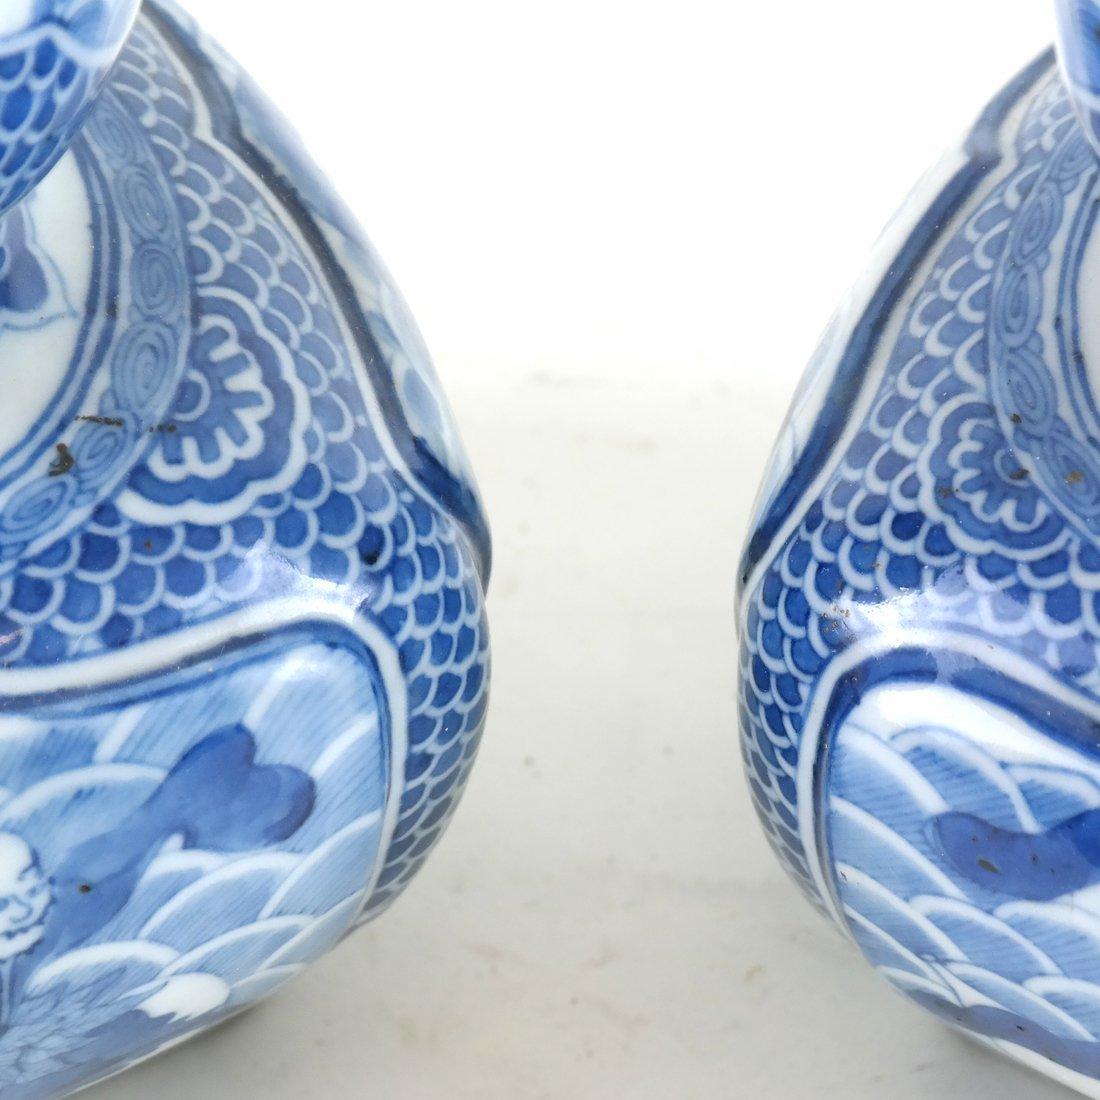 Pair of Asian-Style Blue & White Vases - 4